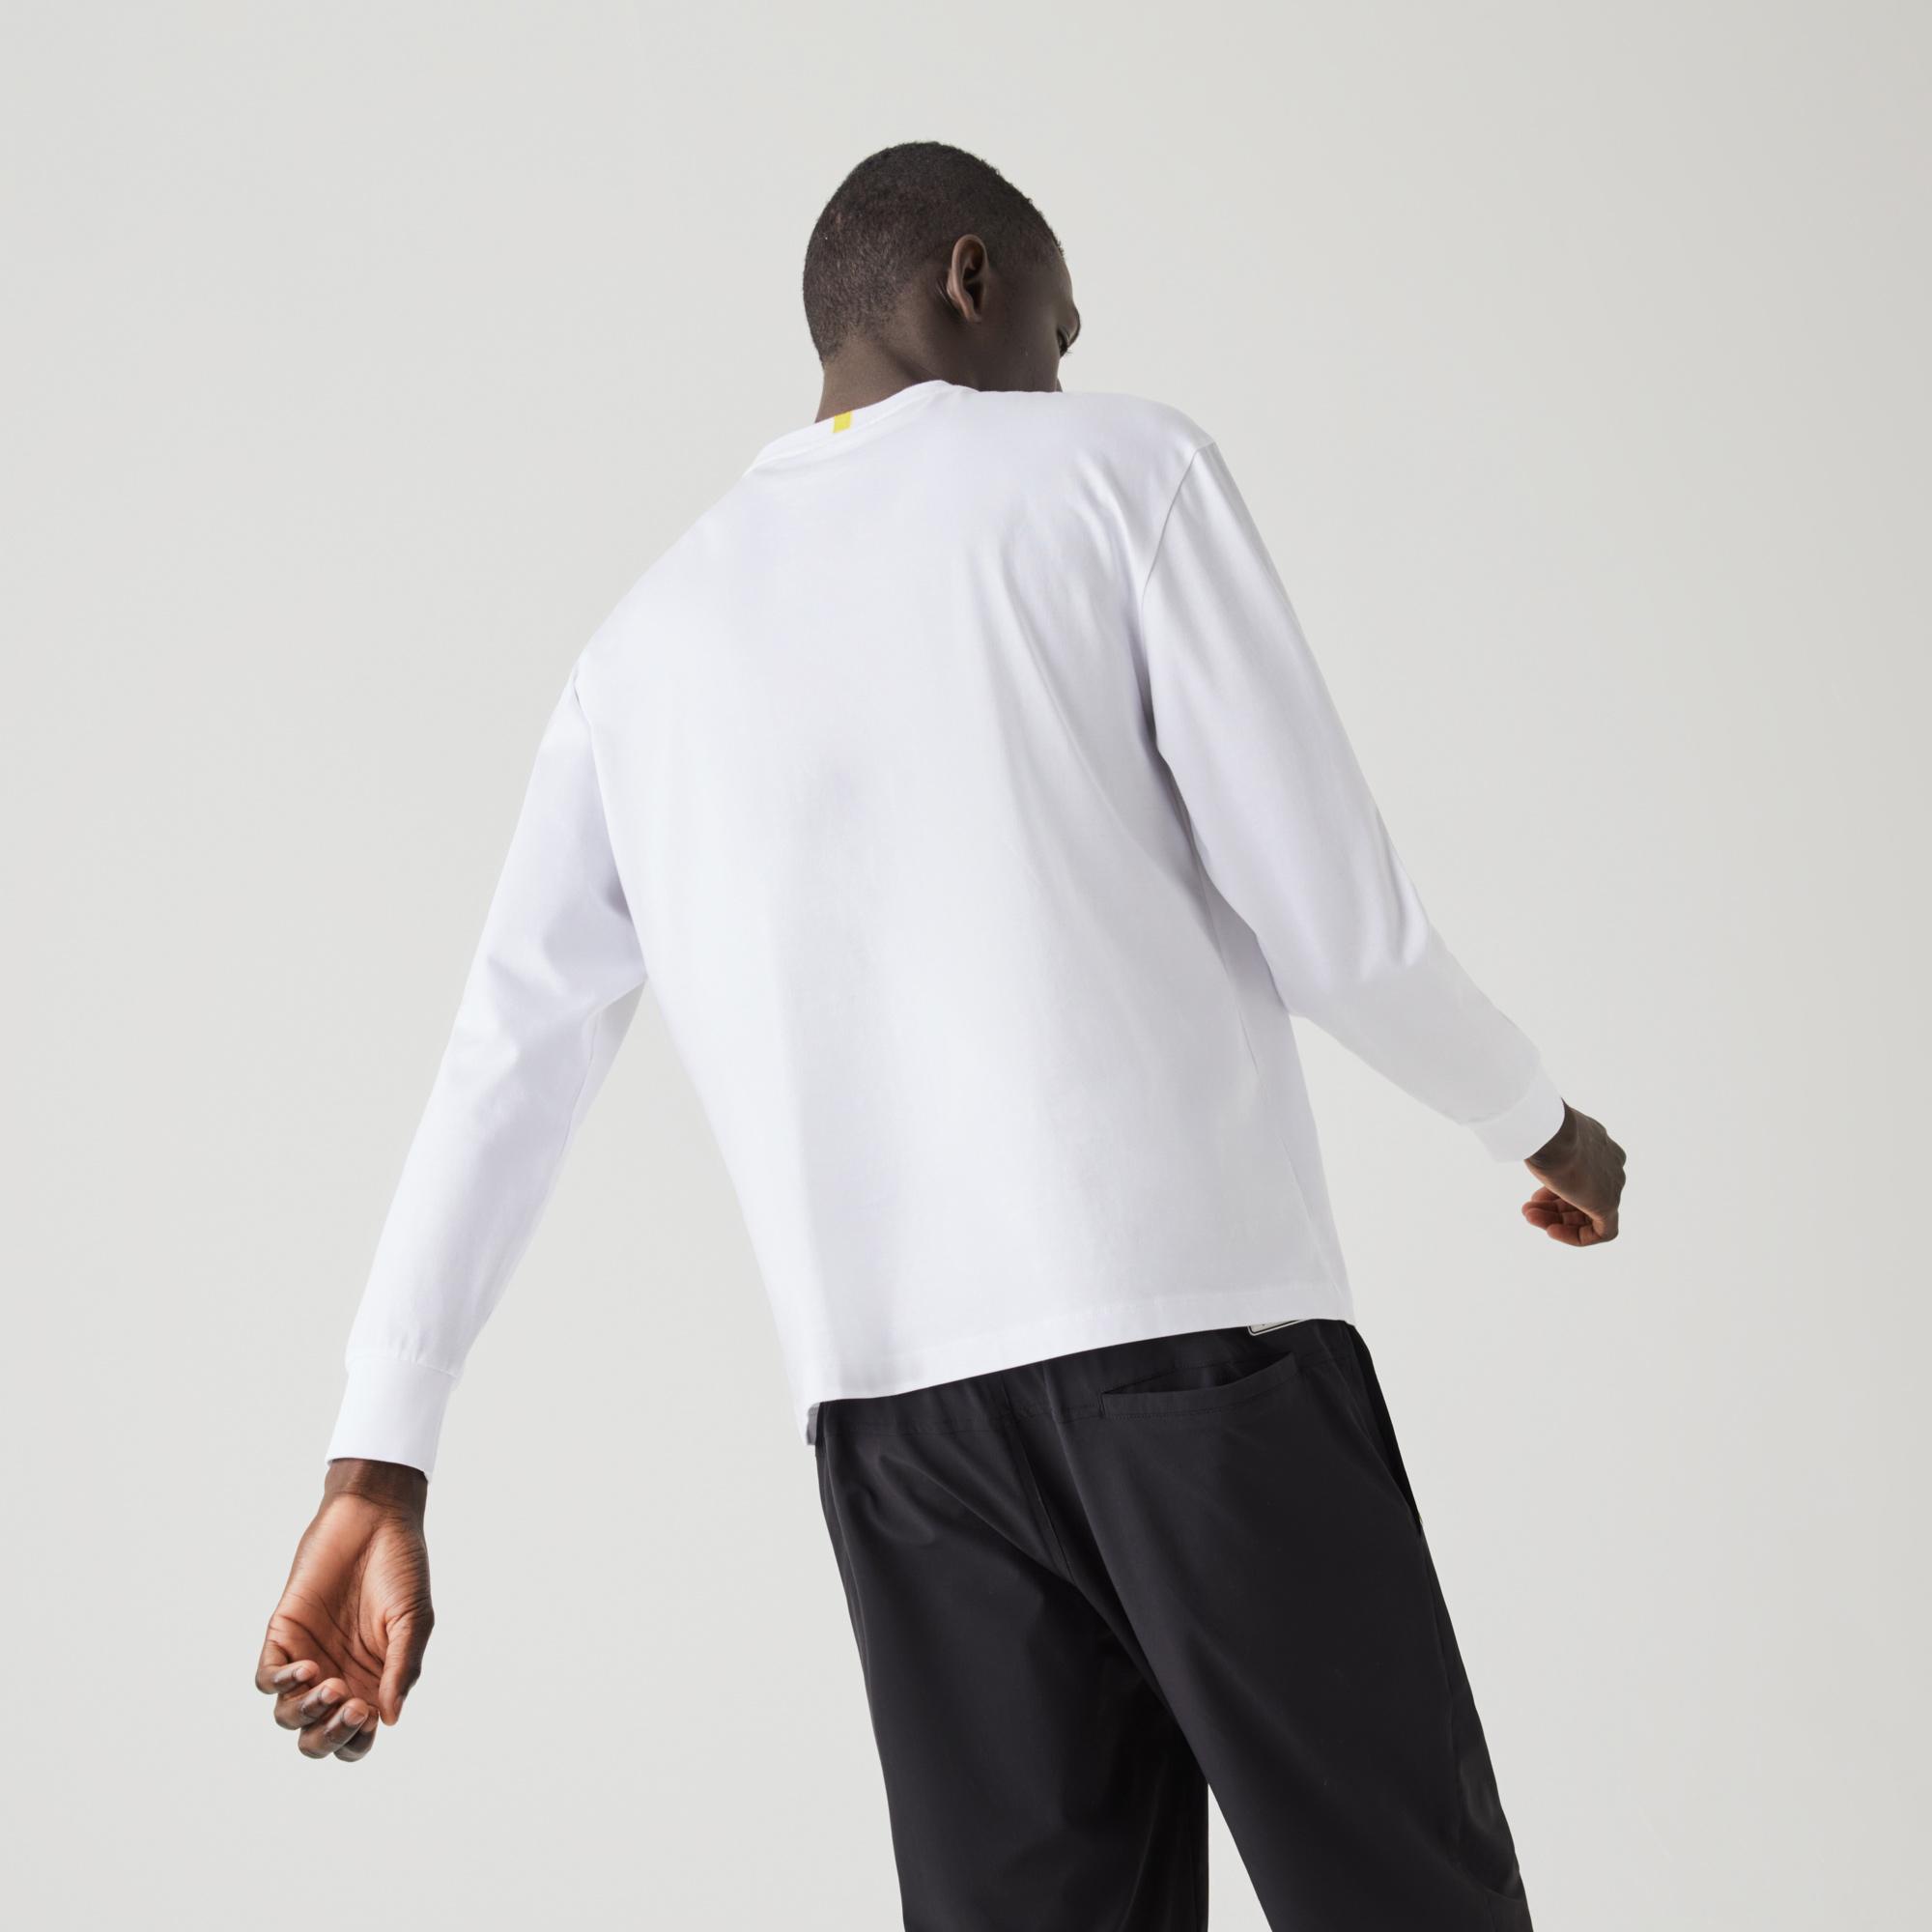 Lacoste Men's x National Geographic Cotton T-shirt